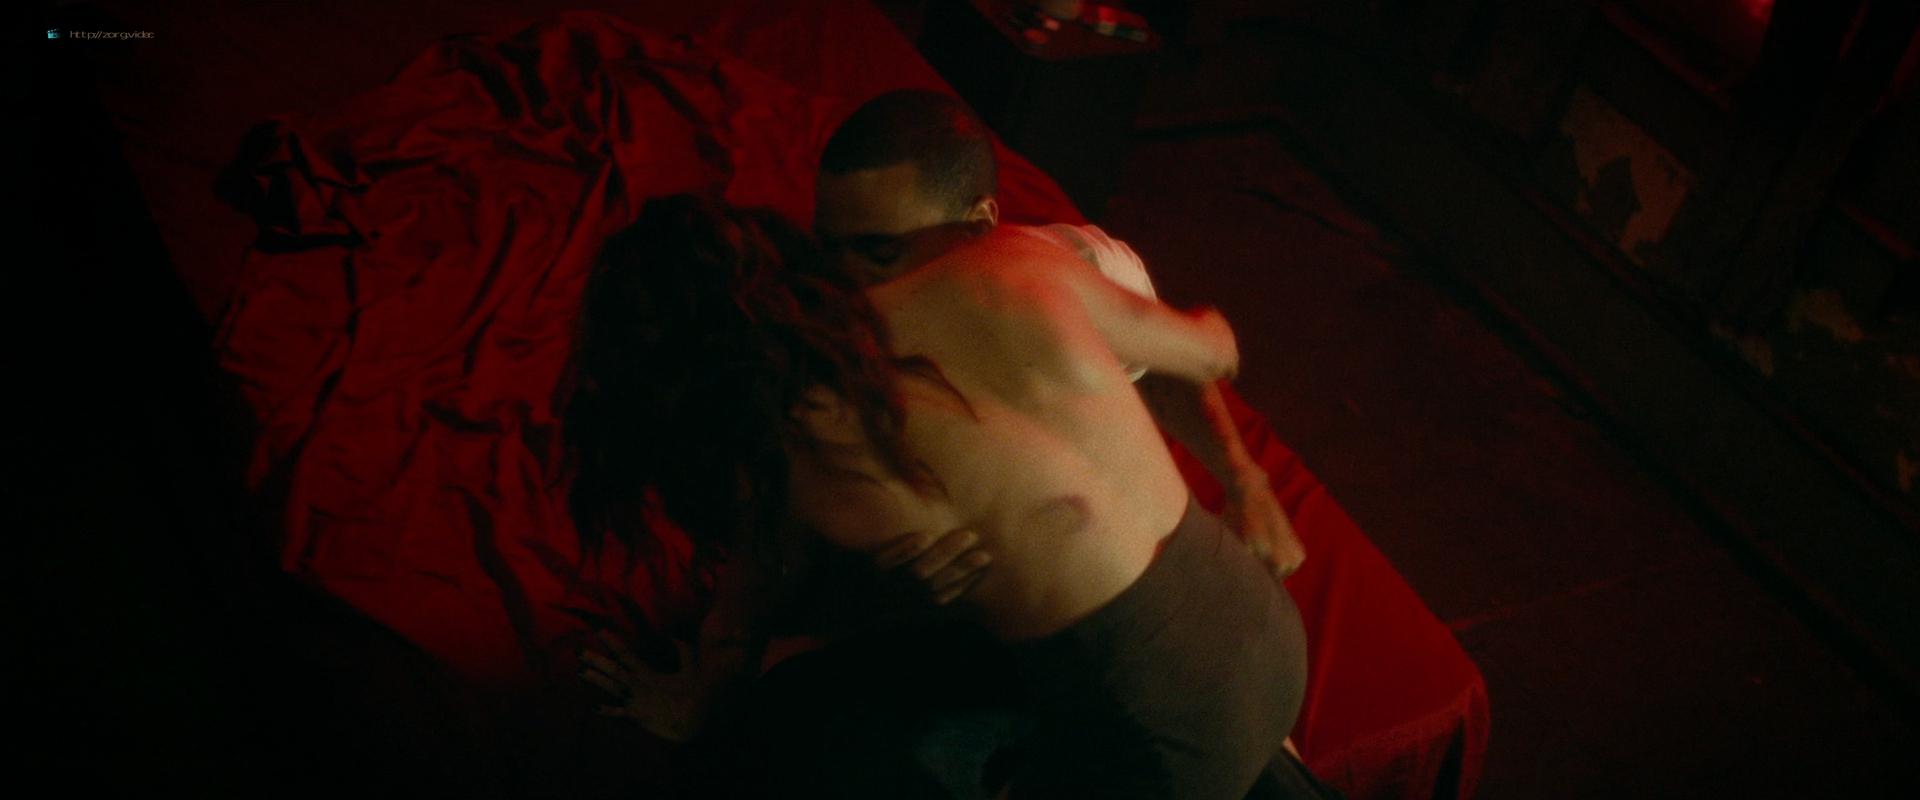 Karla Souza nude hot sex - Jacob's Ladder (2019) HD 1080p (6)